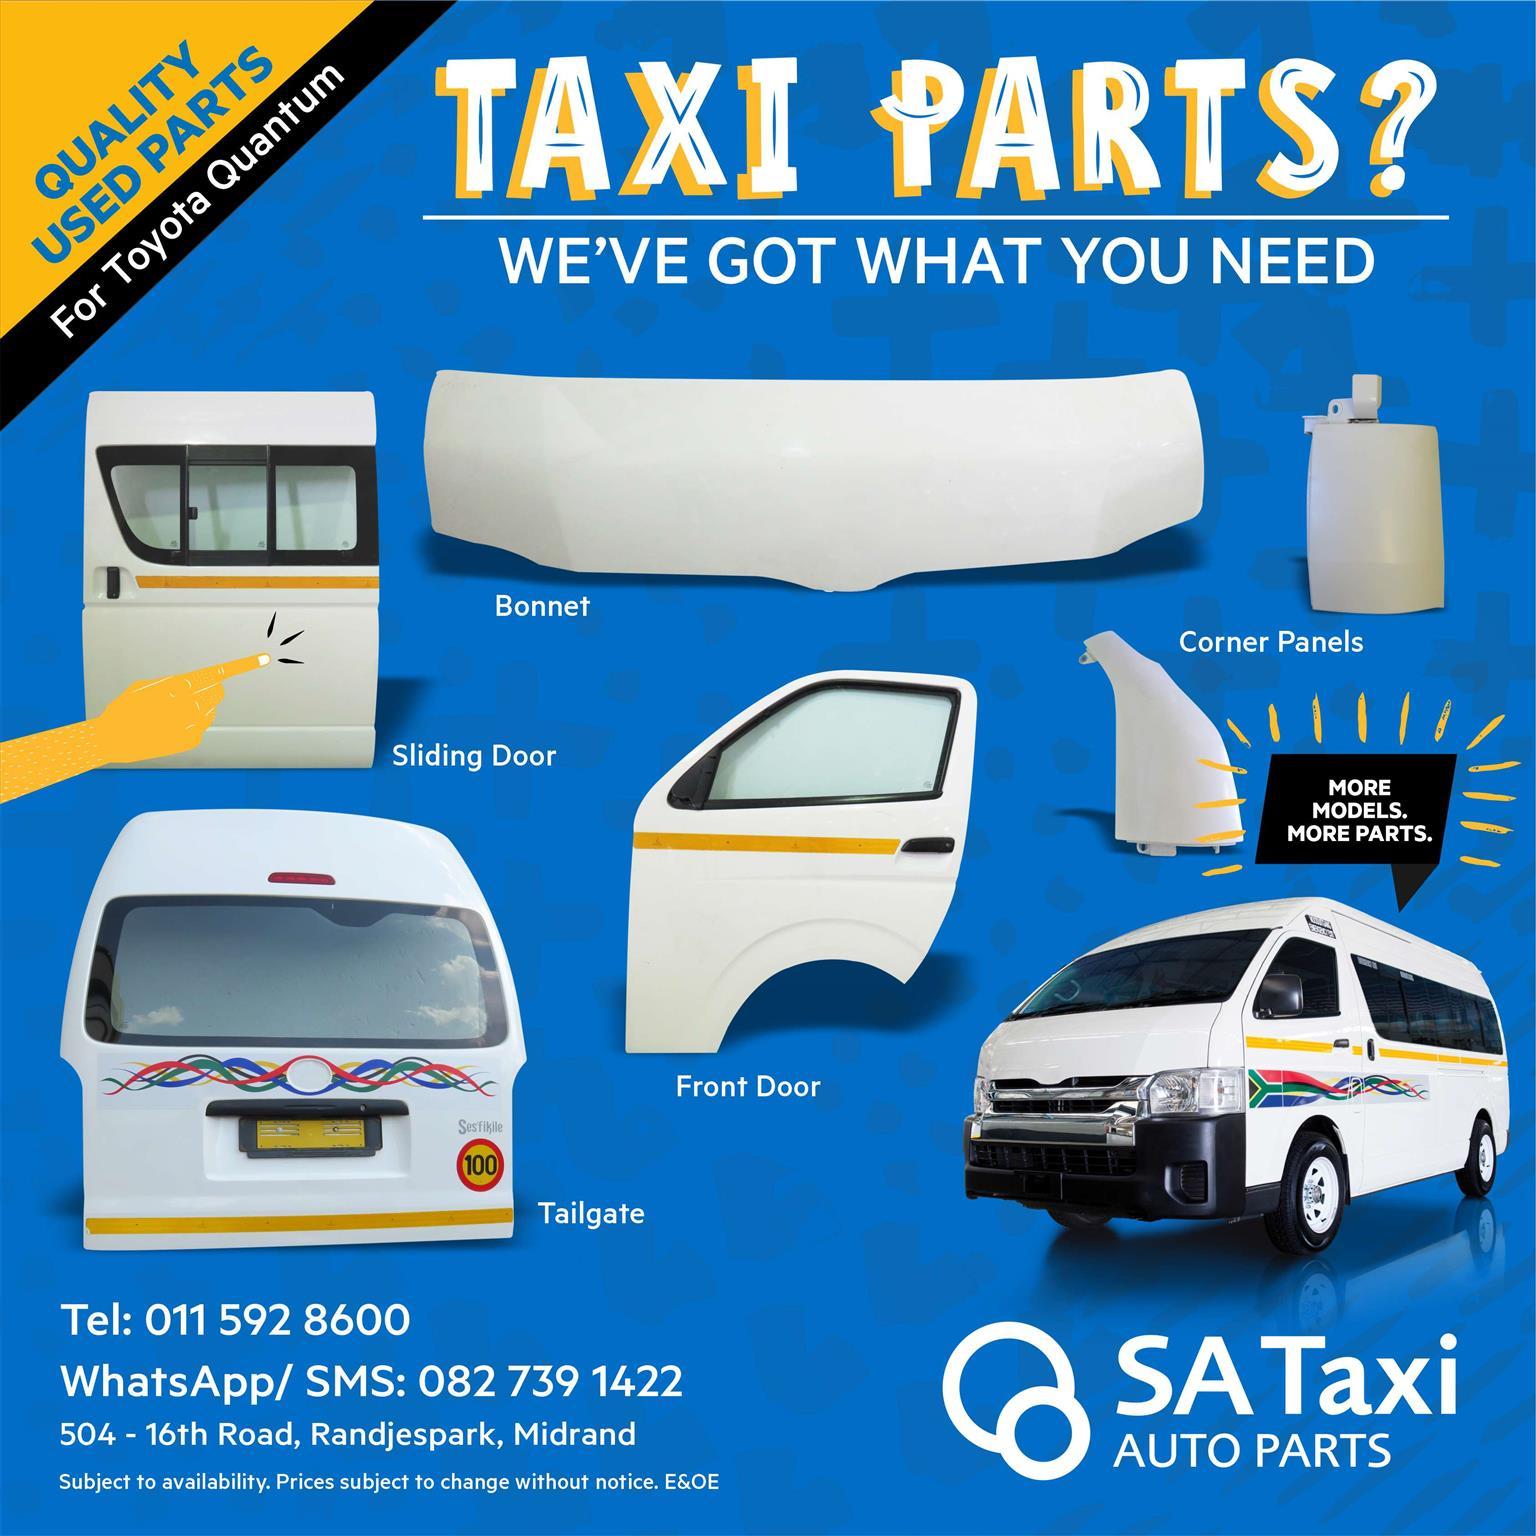 Bonnet Cable suitable for Toyota Quantum - SA Taxi Auto Parts quality used spares